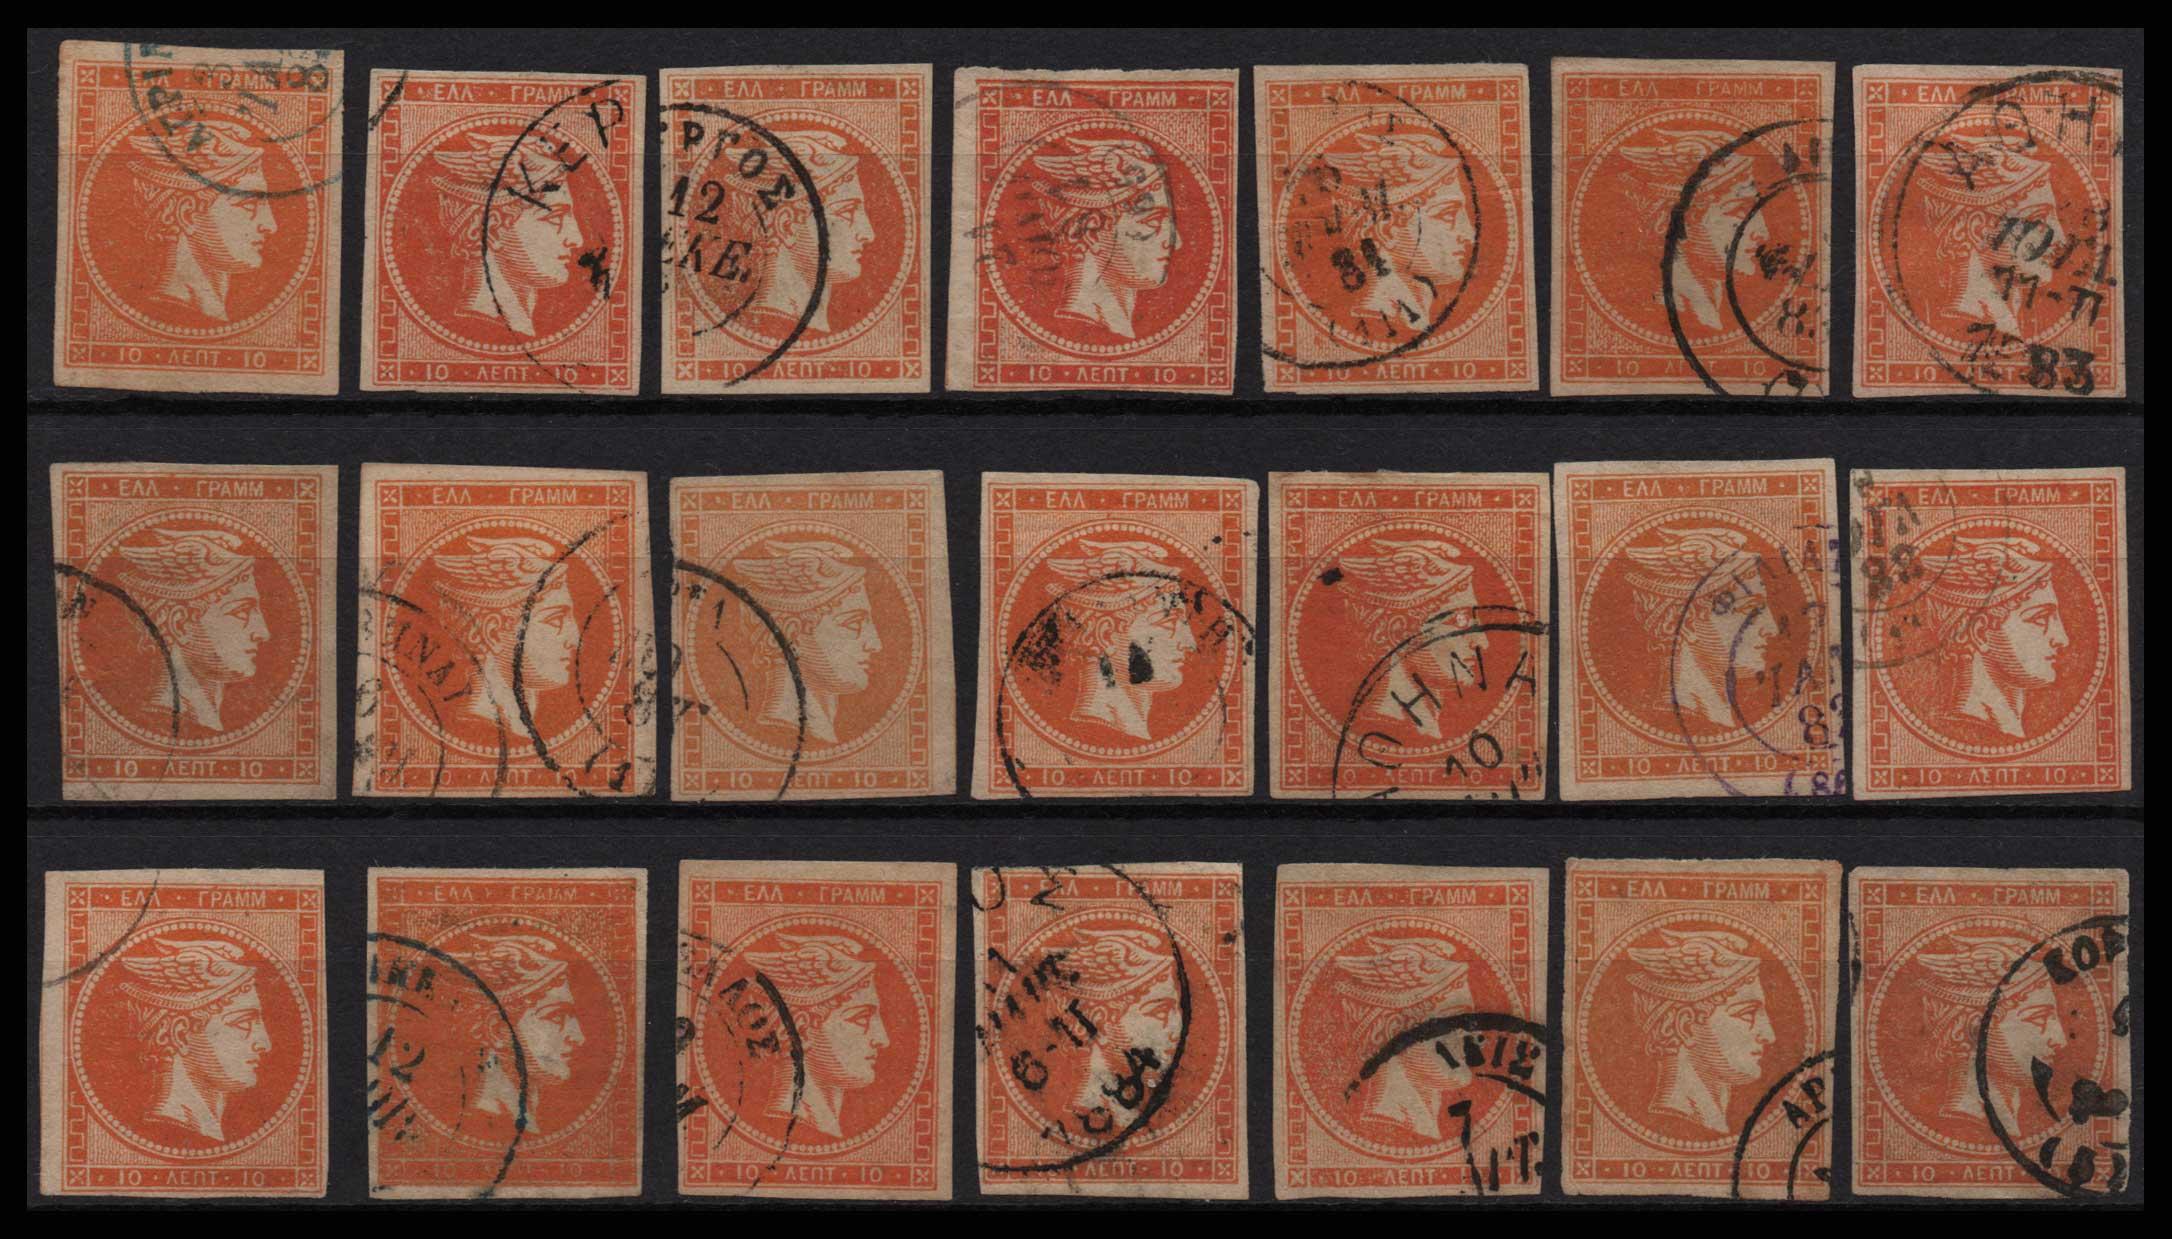 Lot 29 - -  LARGE HERMES HEAD large hermes head -  Athens Auctions Public Auction 82 General Stamp Sale